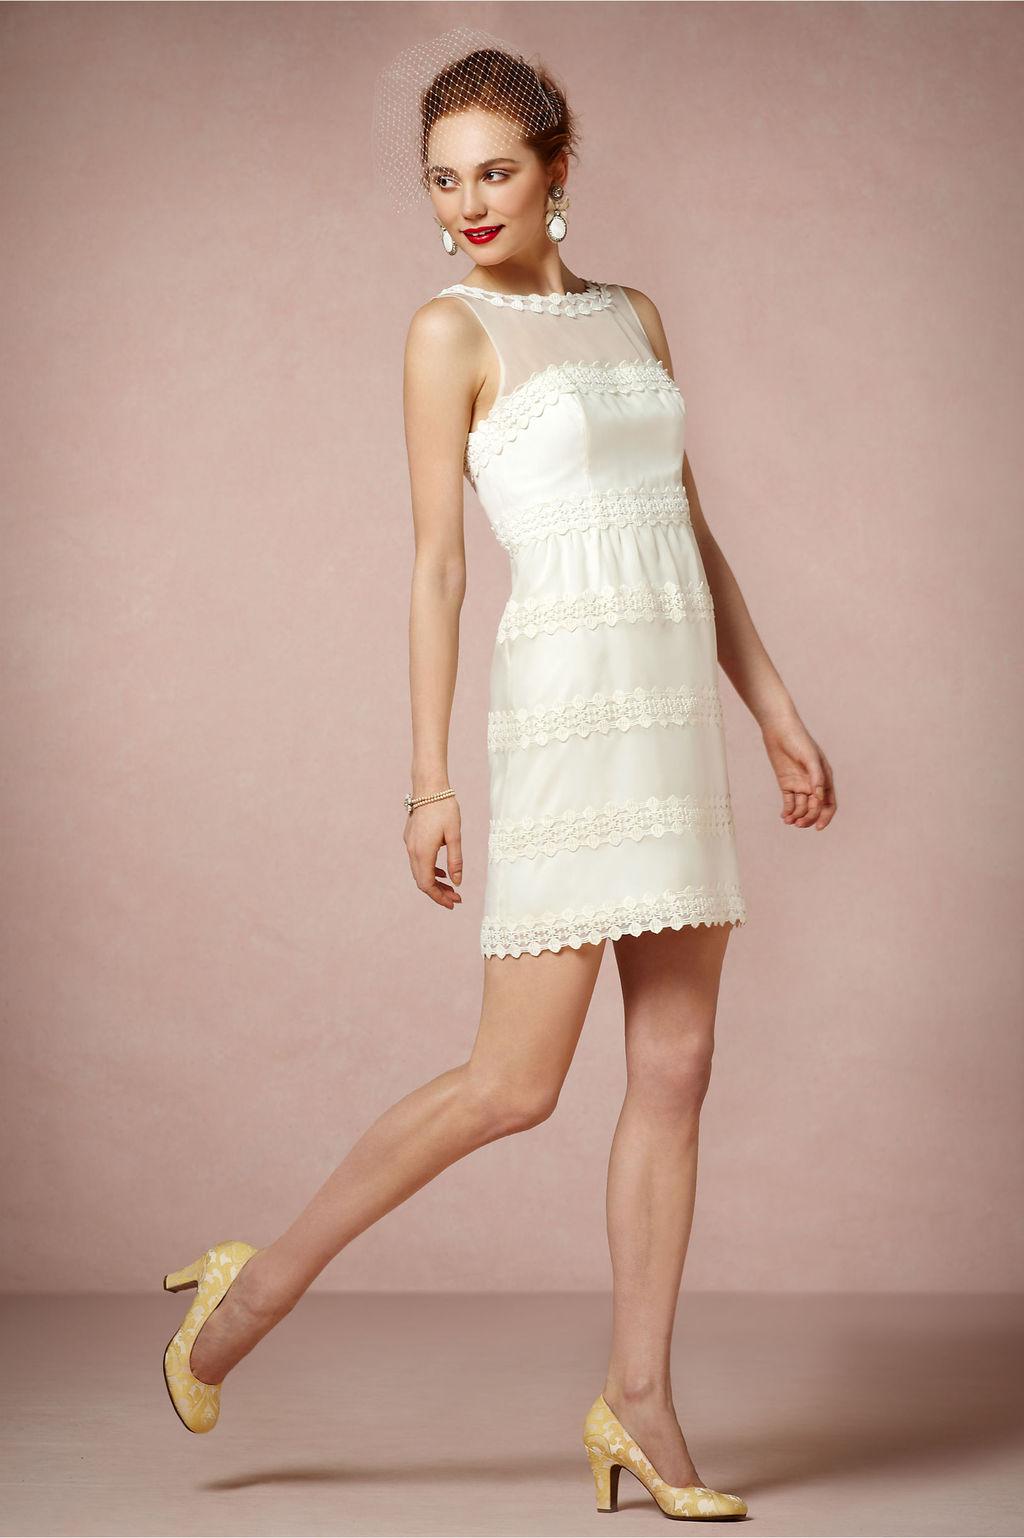 Ivory Wedding Reception Dress with Illusion Neckline